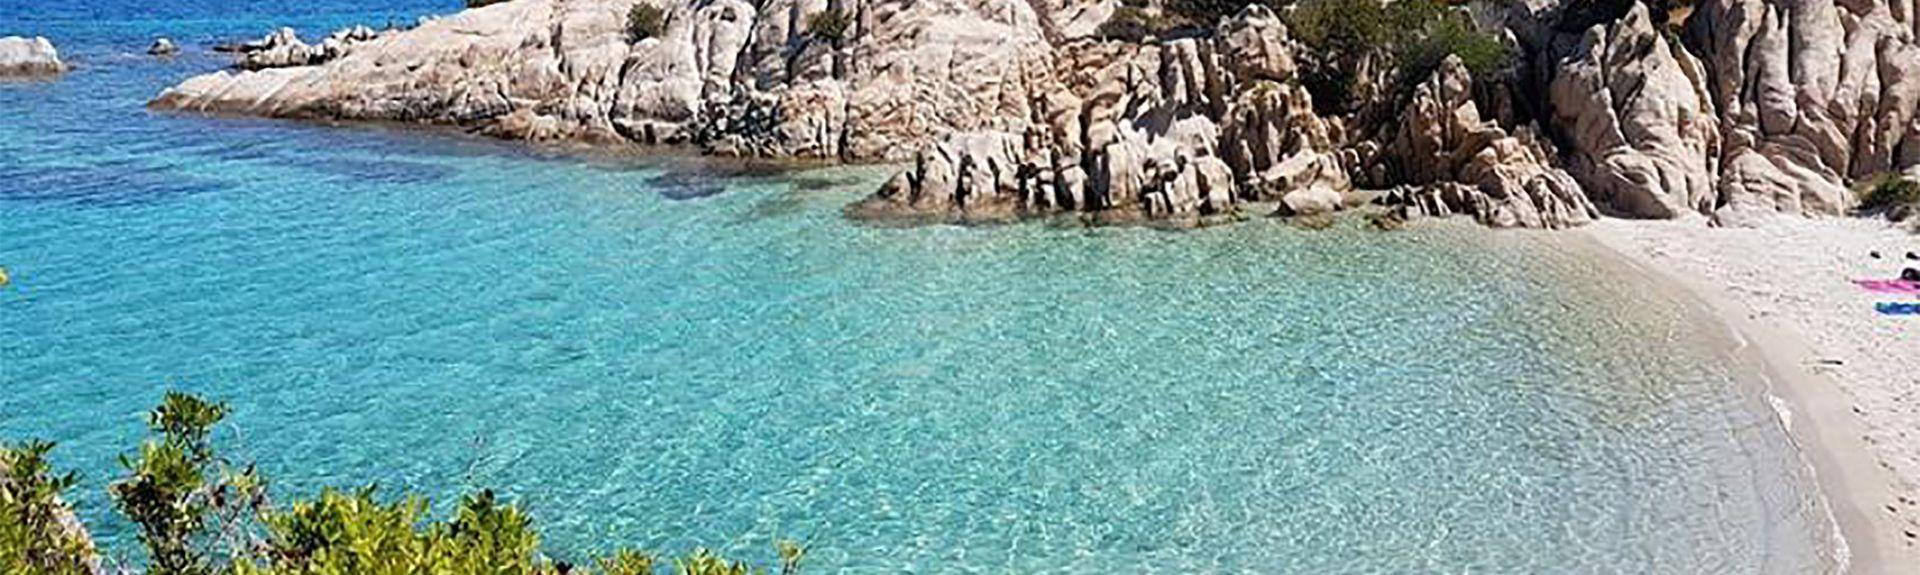 Porto Ottiolu, Budoni, Sardinia, Italy